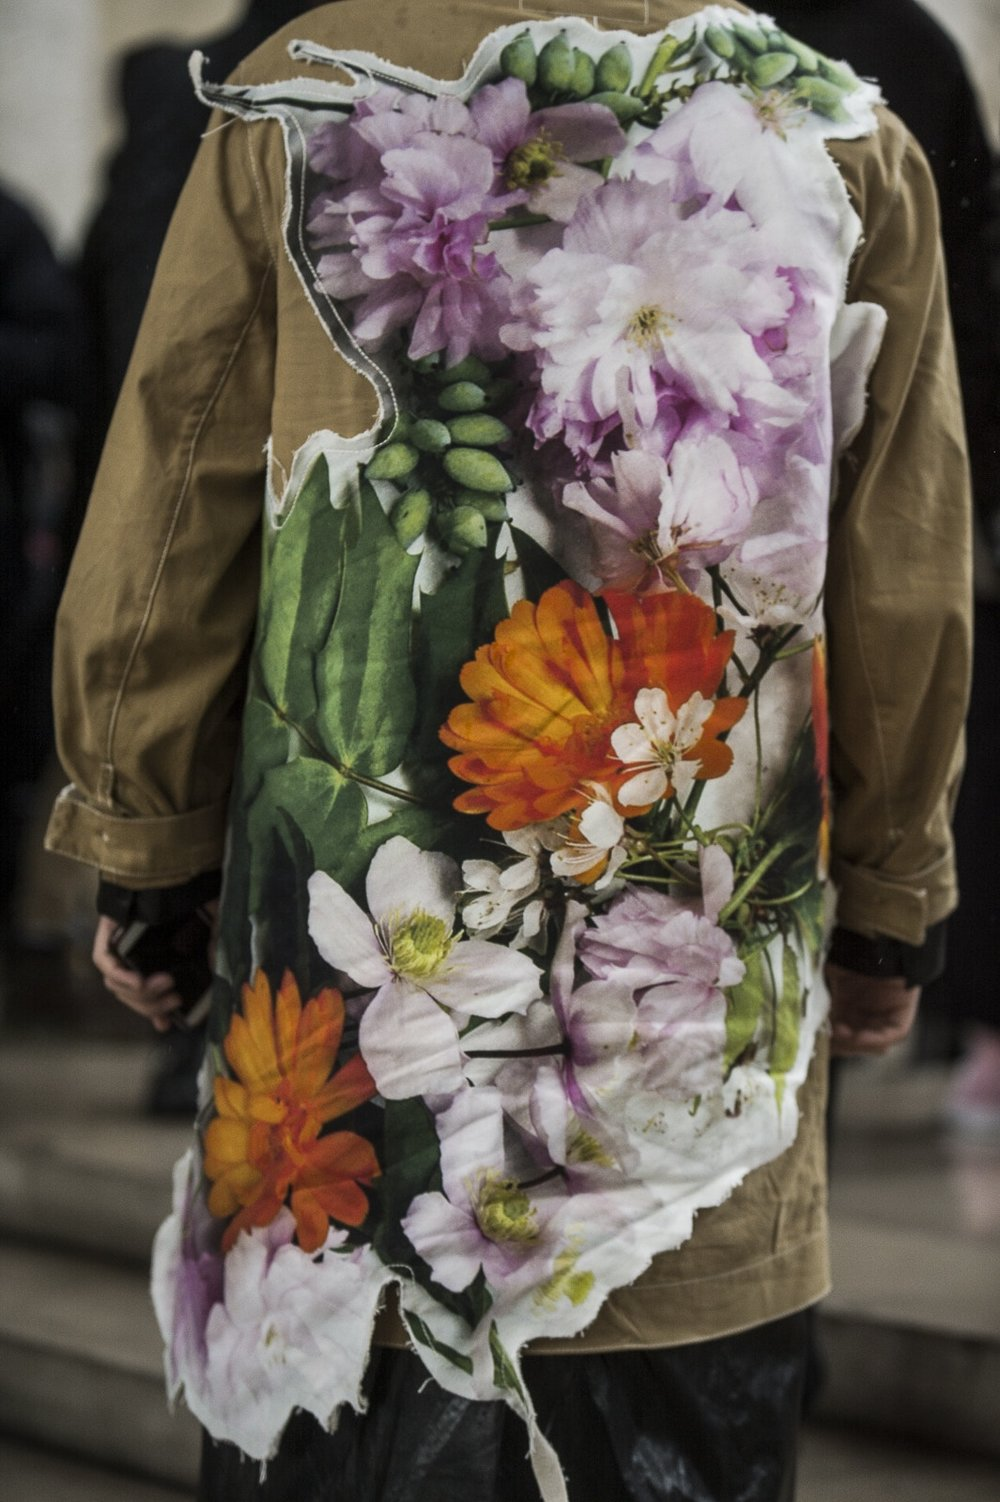 paris-fashion-week-fall-winter-2018-street-style-day-2-16-1.jpg